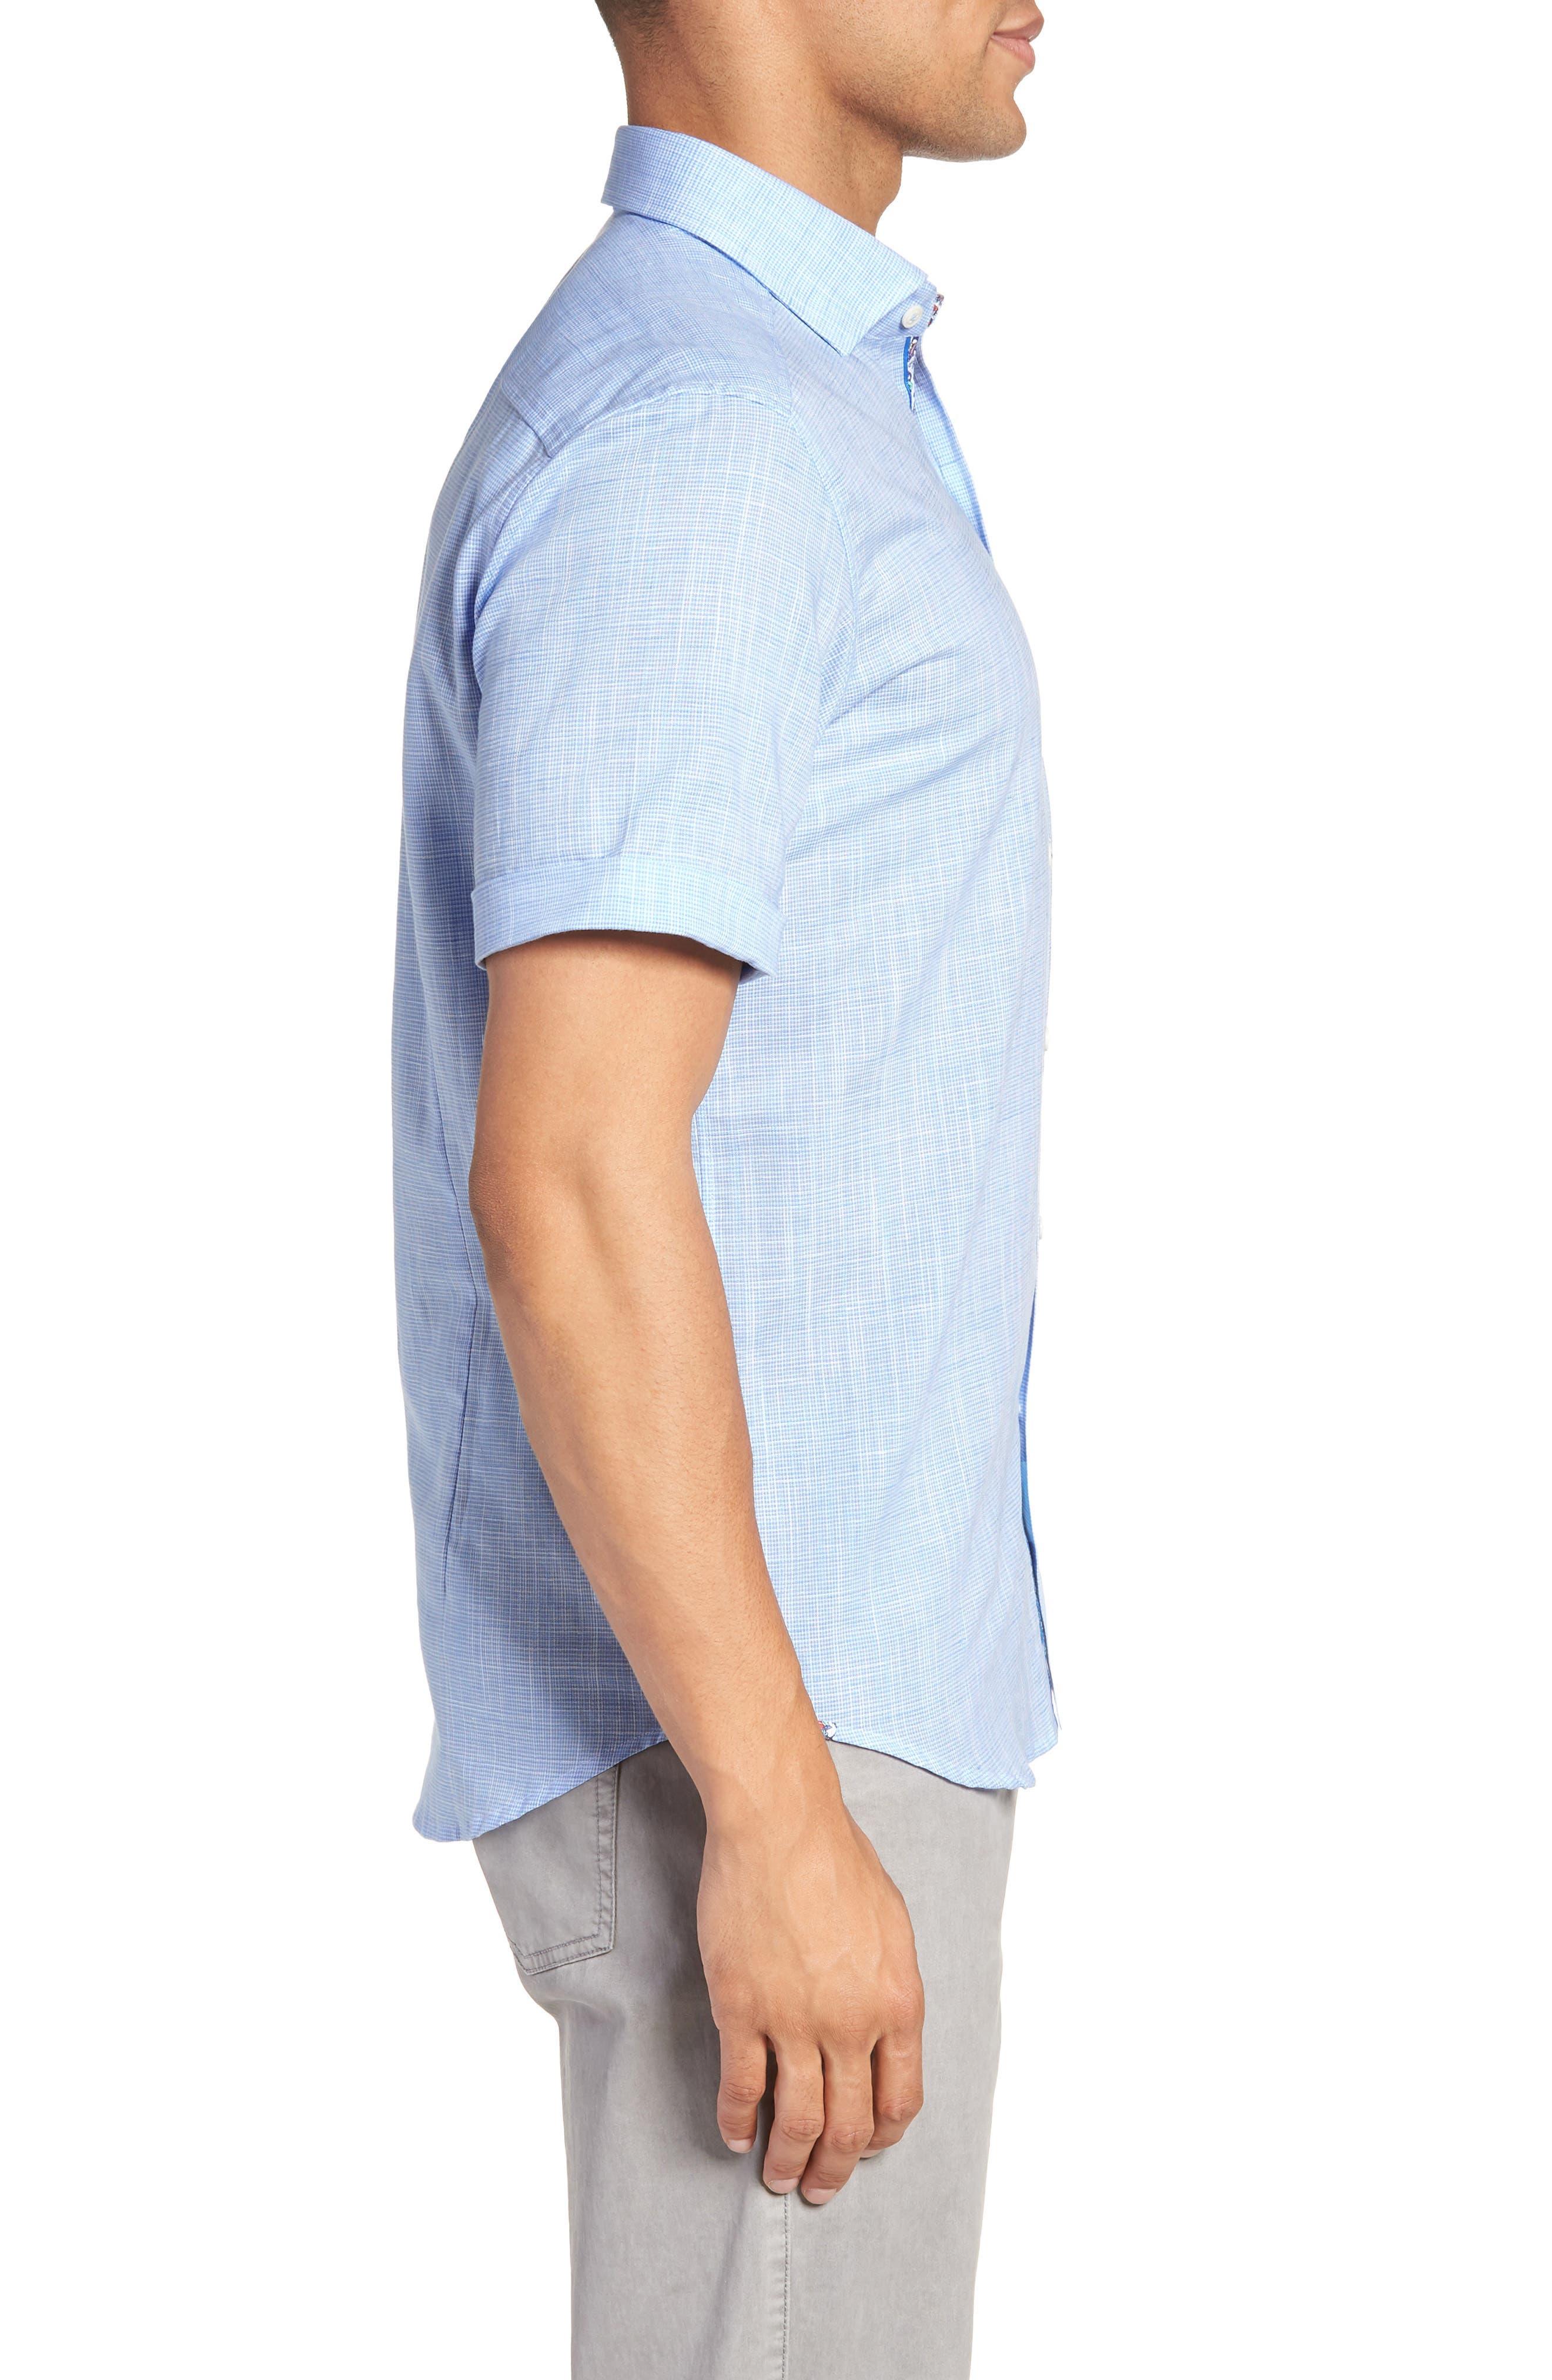 ROBERT GRAHAM,                             Isia Tailored Fit Sport Shirt,                             Alternate thumbnail 3, color,                             400